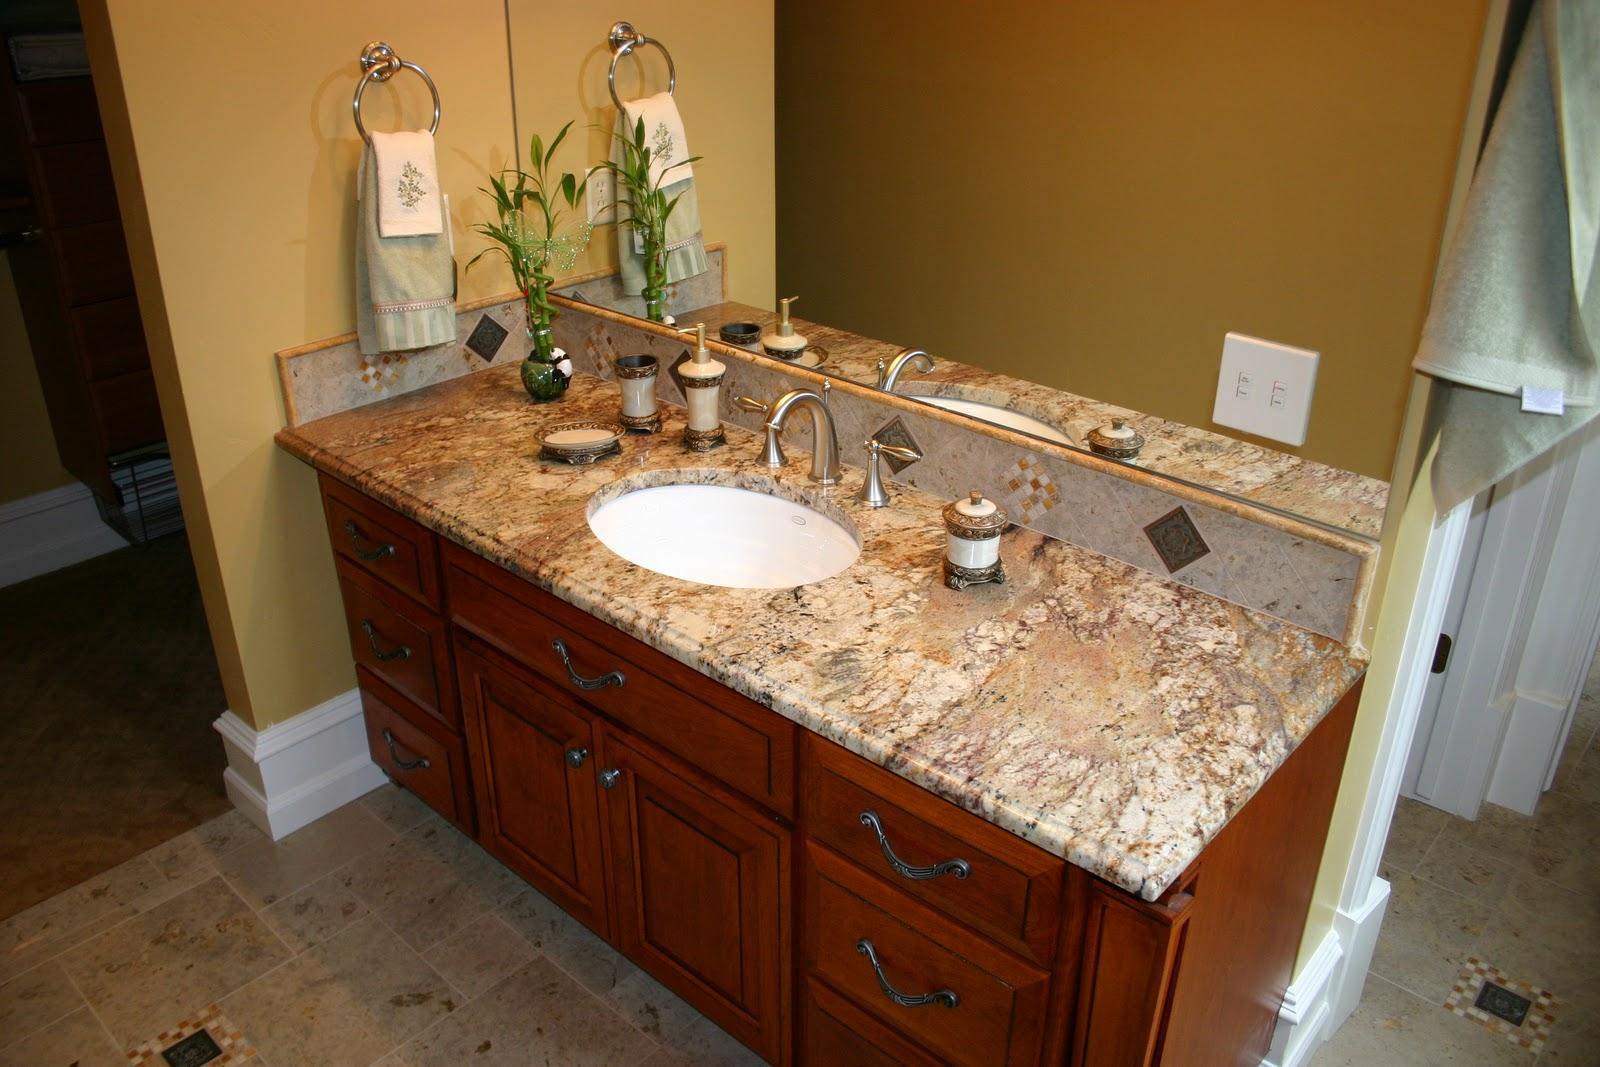 The Granite Gurus: Typhoon Bordeaux Granite Bath from MGS by Design